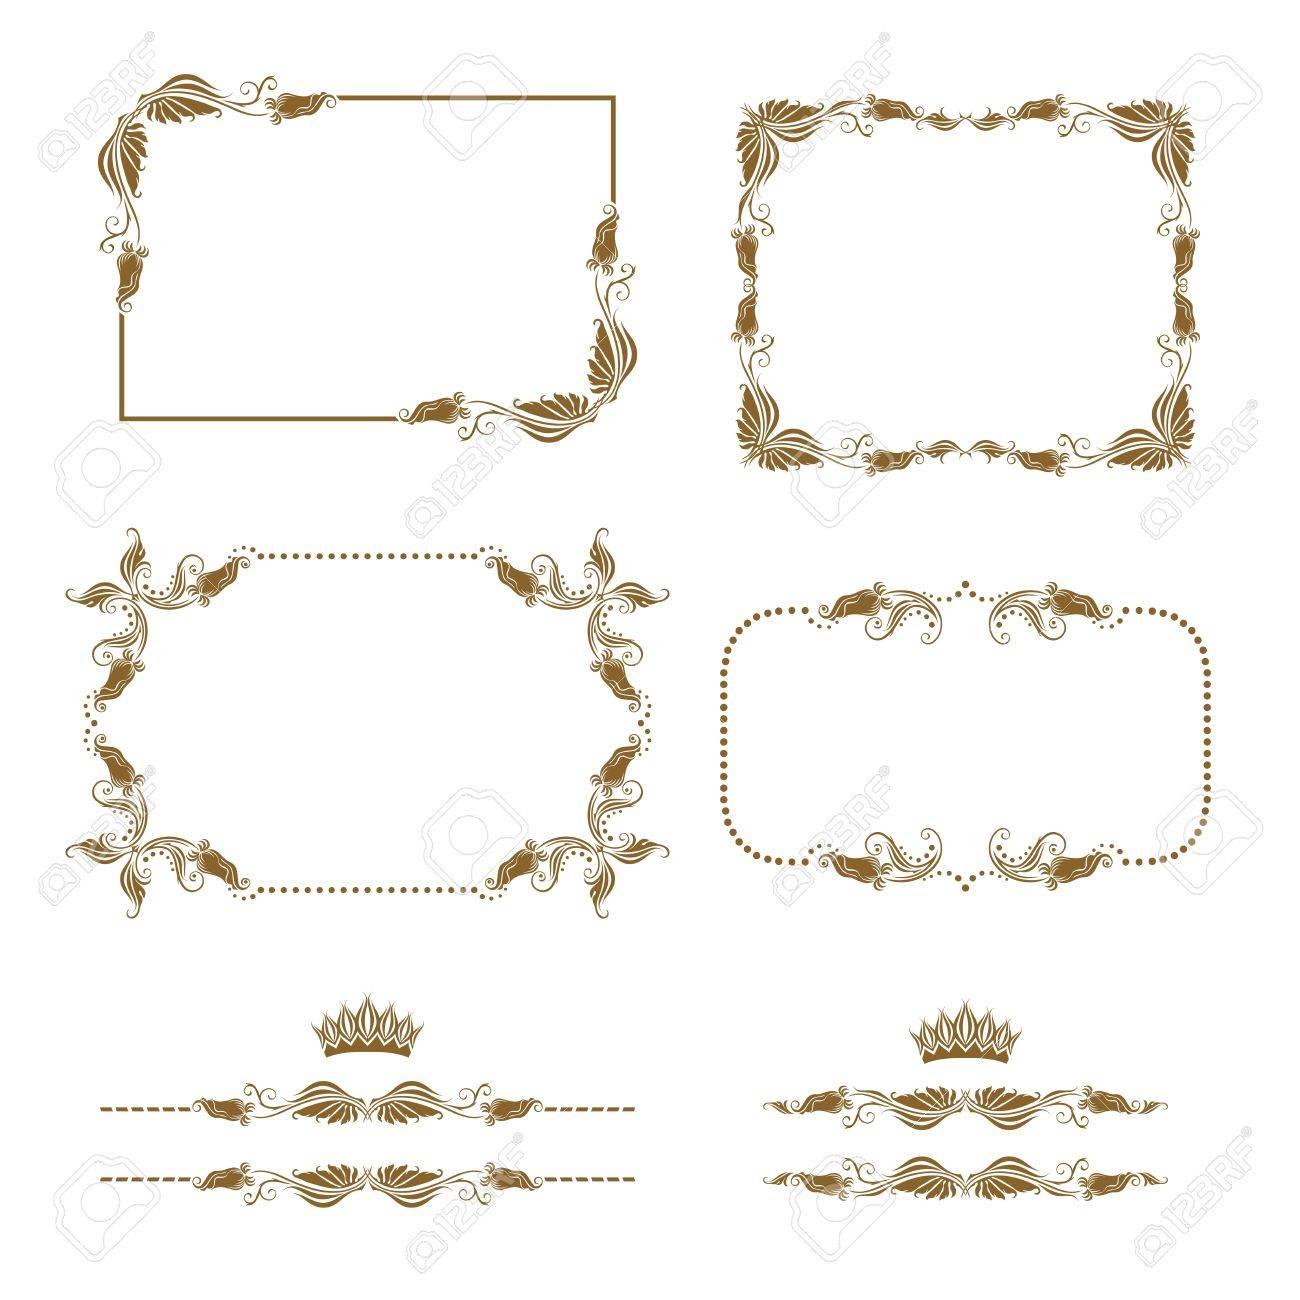 Vector set of decorative horizontal elements, border, frame Stock Vector - 12776632